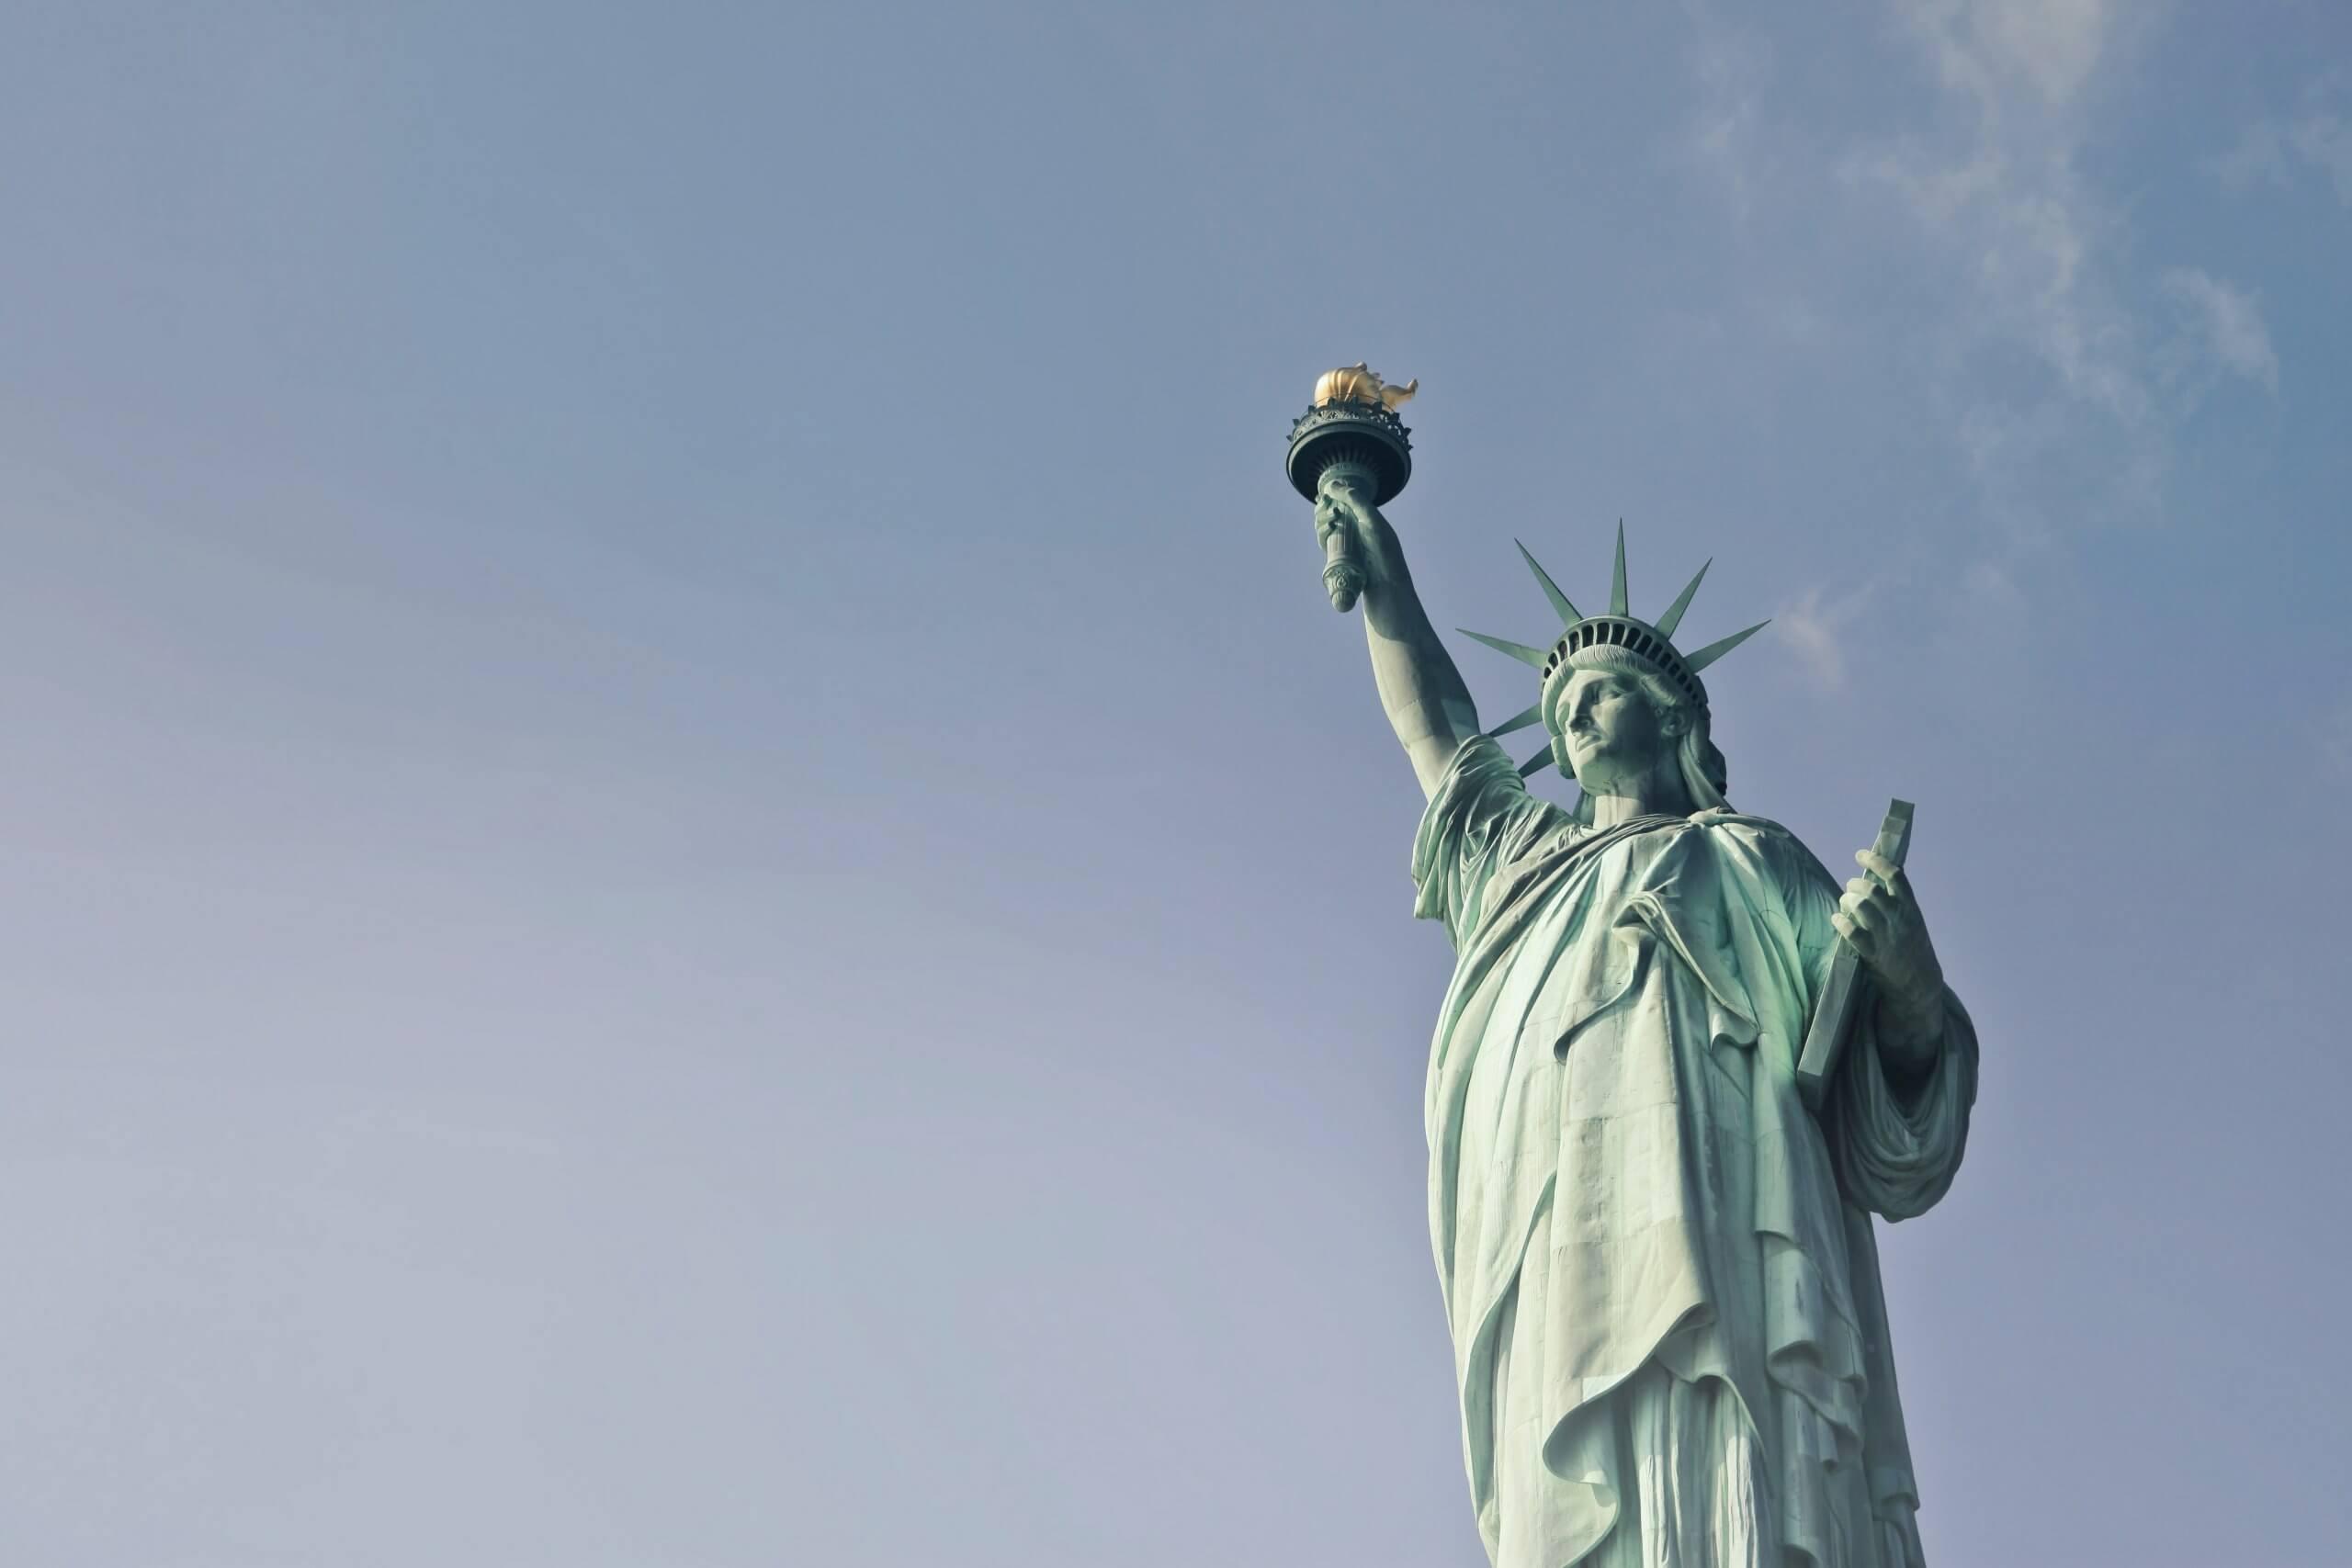 [FOTO] Univerzalan simbol slobode i nade